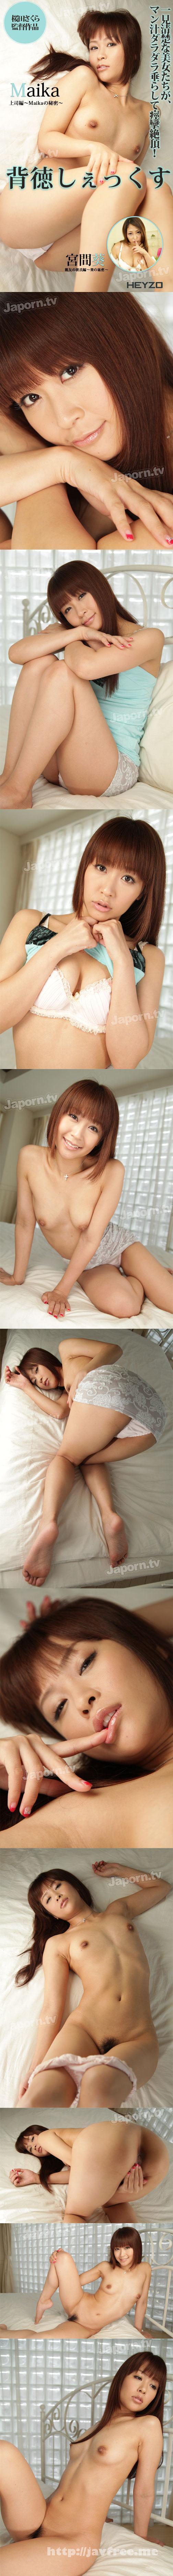 [HEY 060] 背徳しぇっくす :  Maika, 宮間葵 宮間葵 Maika HEY Aoi Miyama